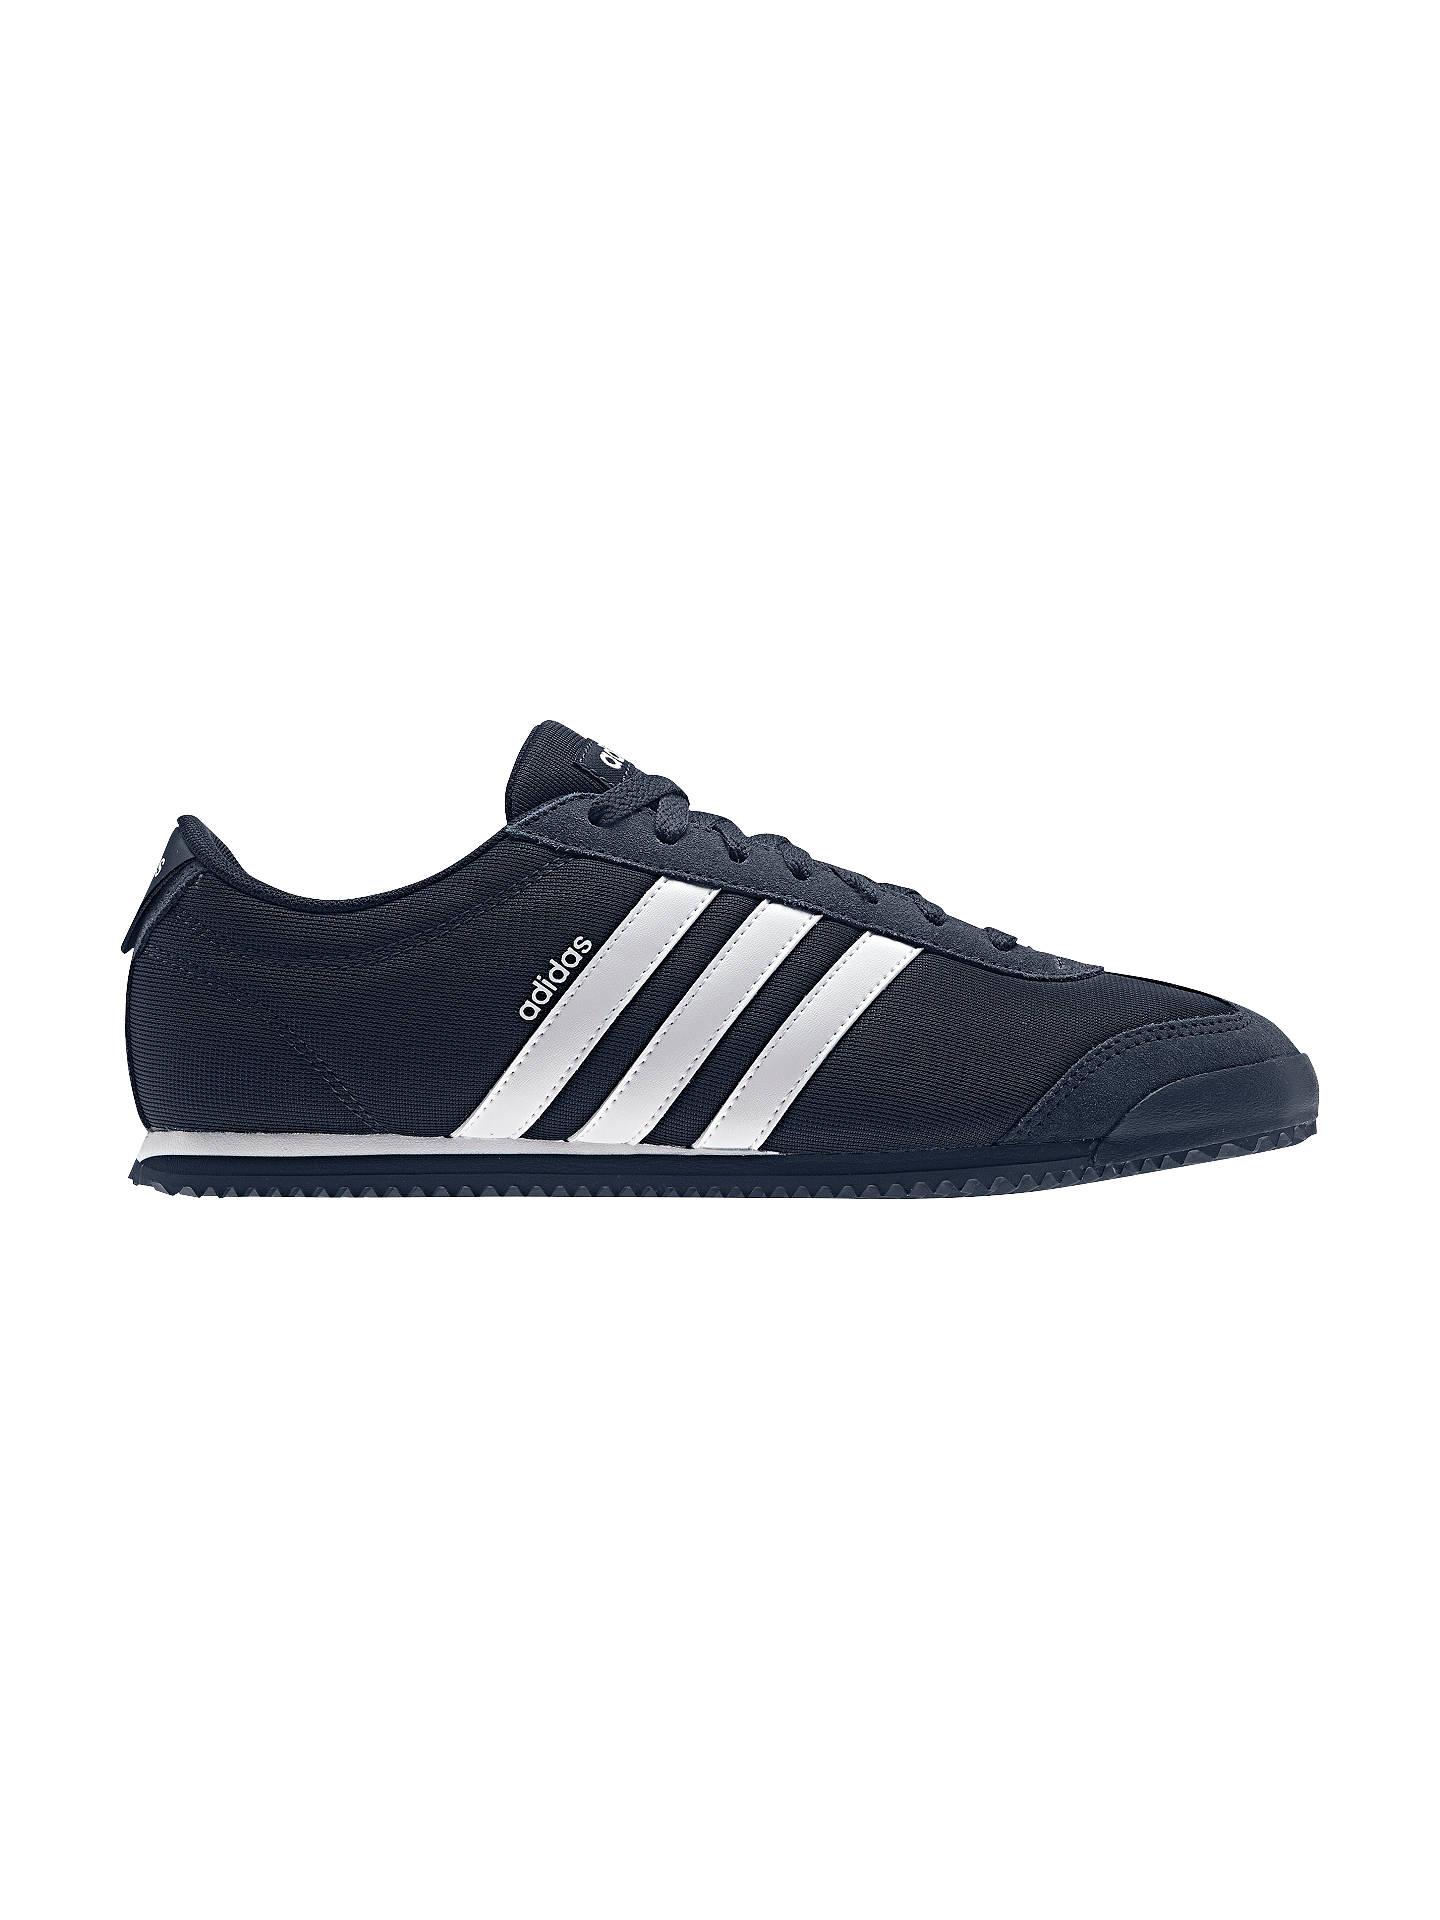 adidas neo trainers navy